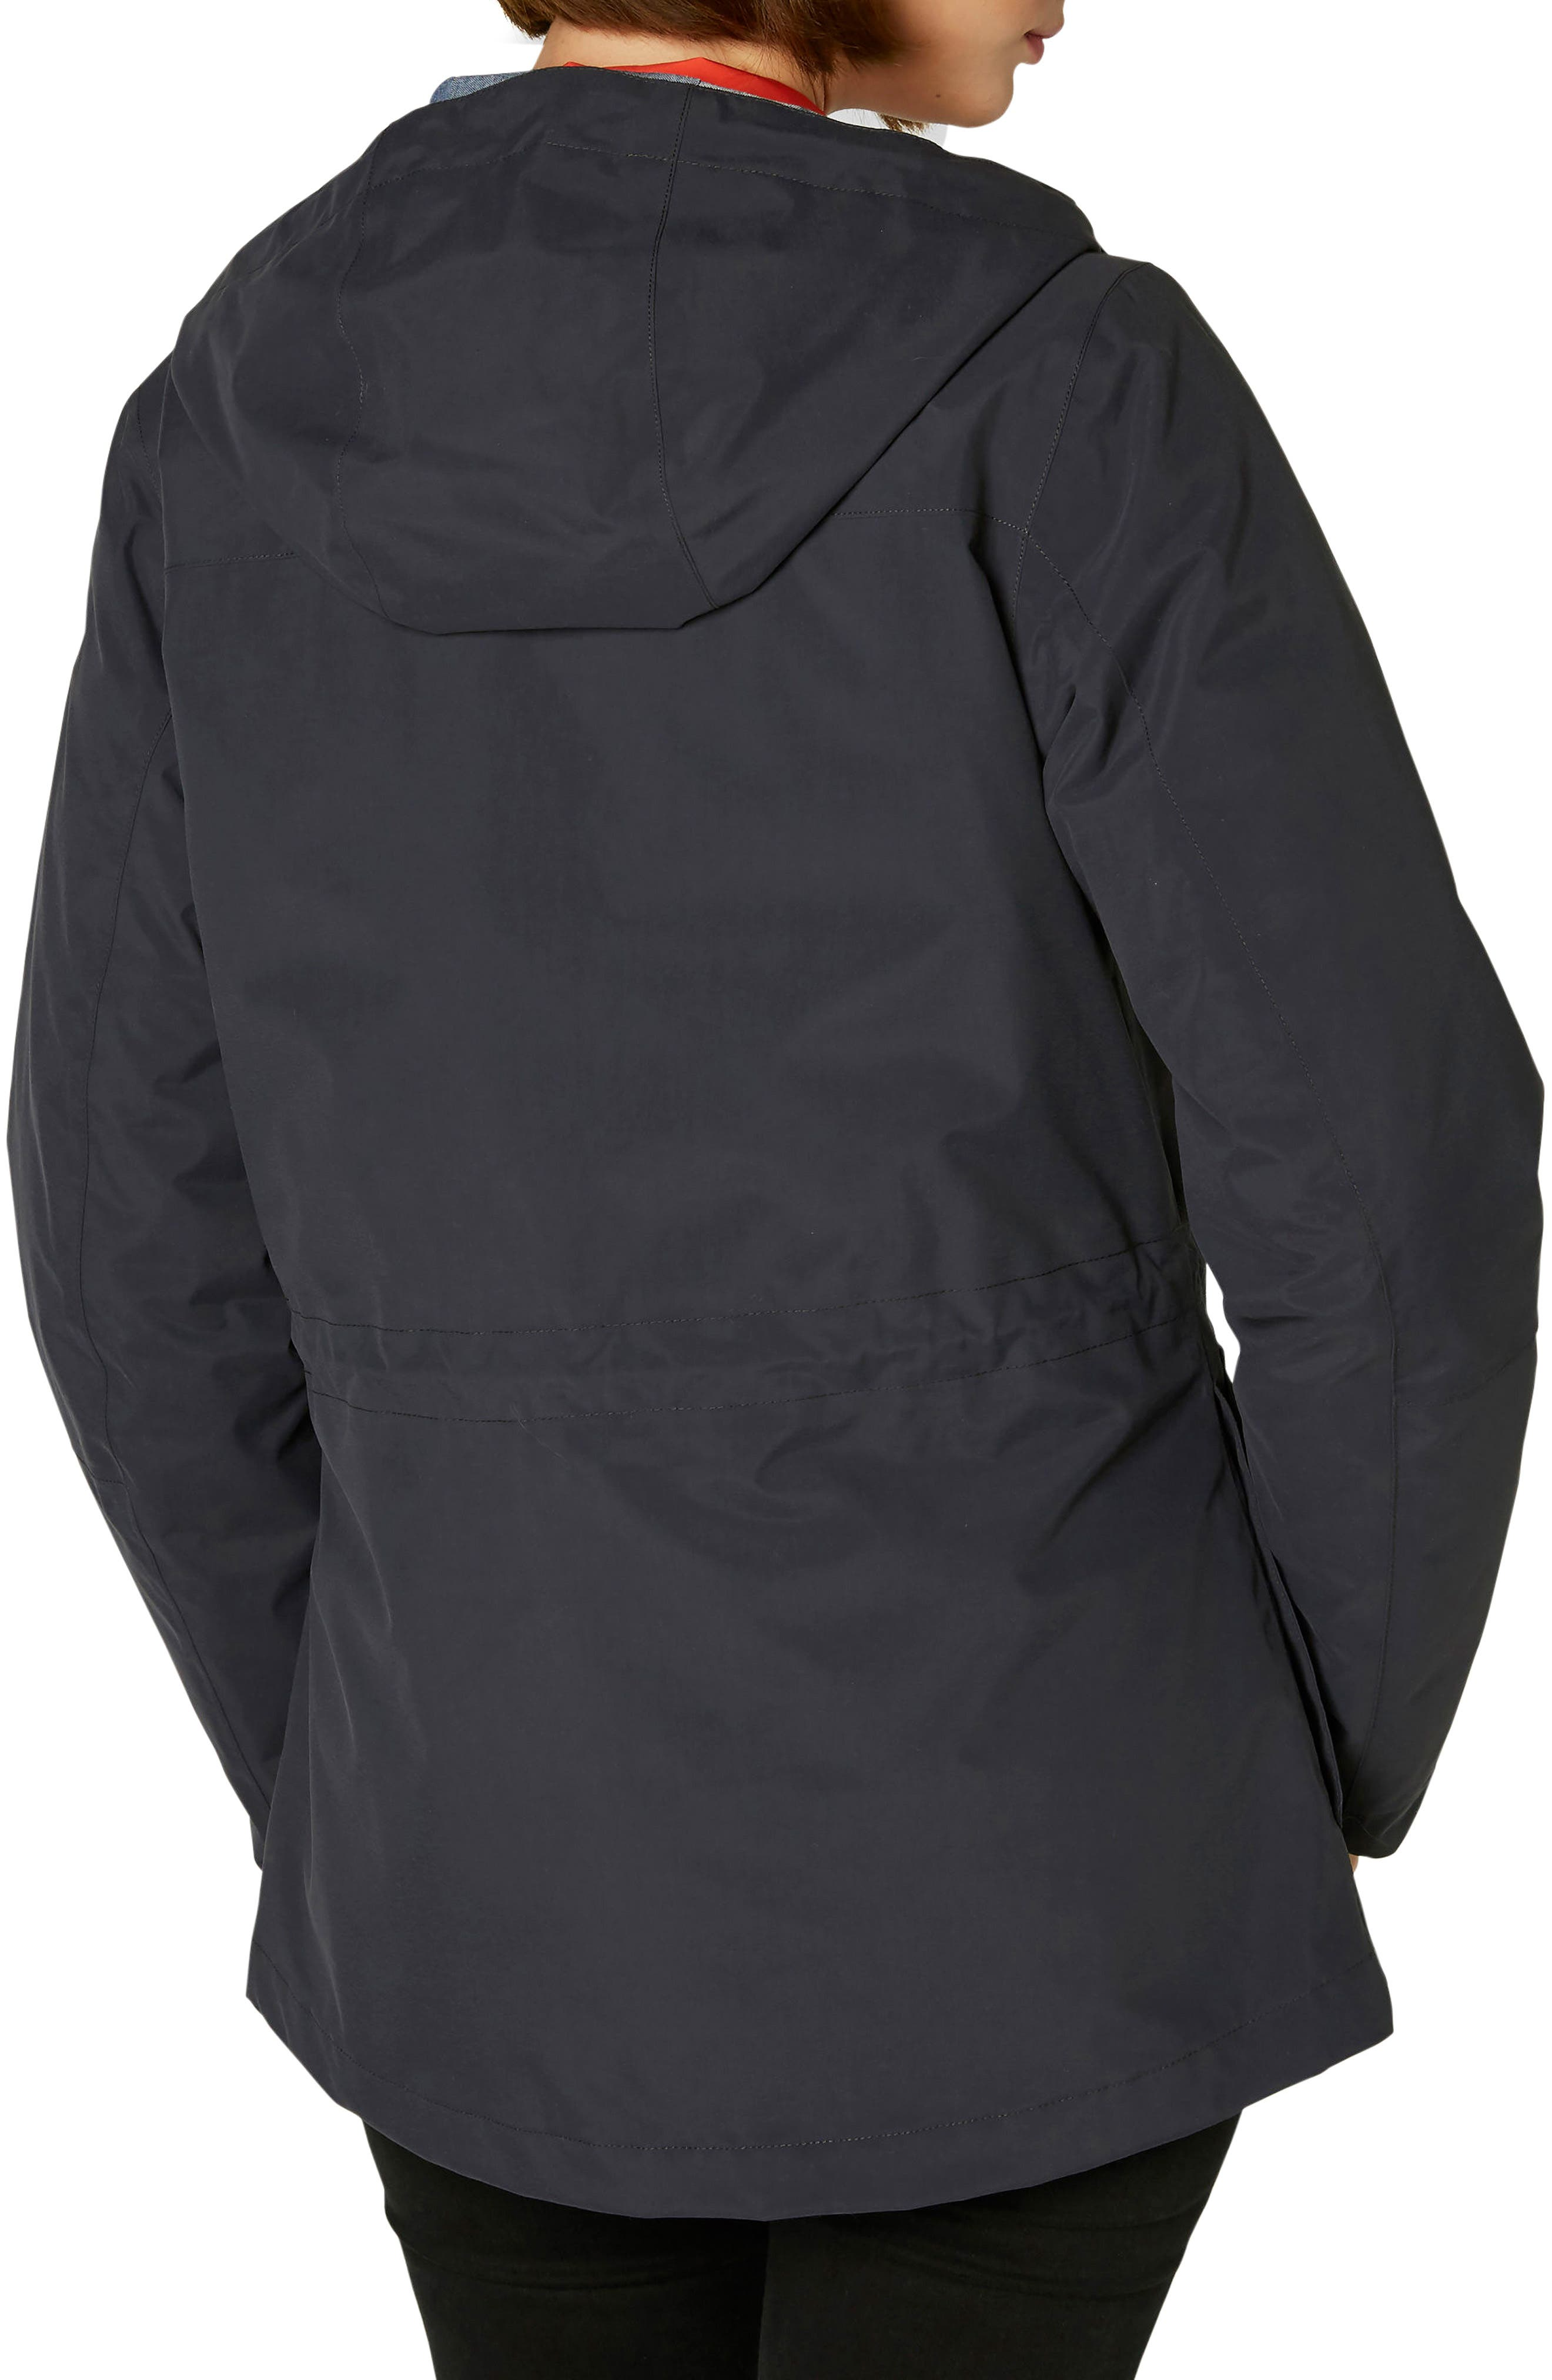 Elements Hooded Rain Jacket,                             Alternate thumbnail 2, color,                             Graphite Blue